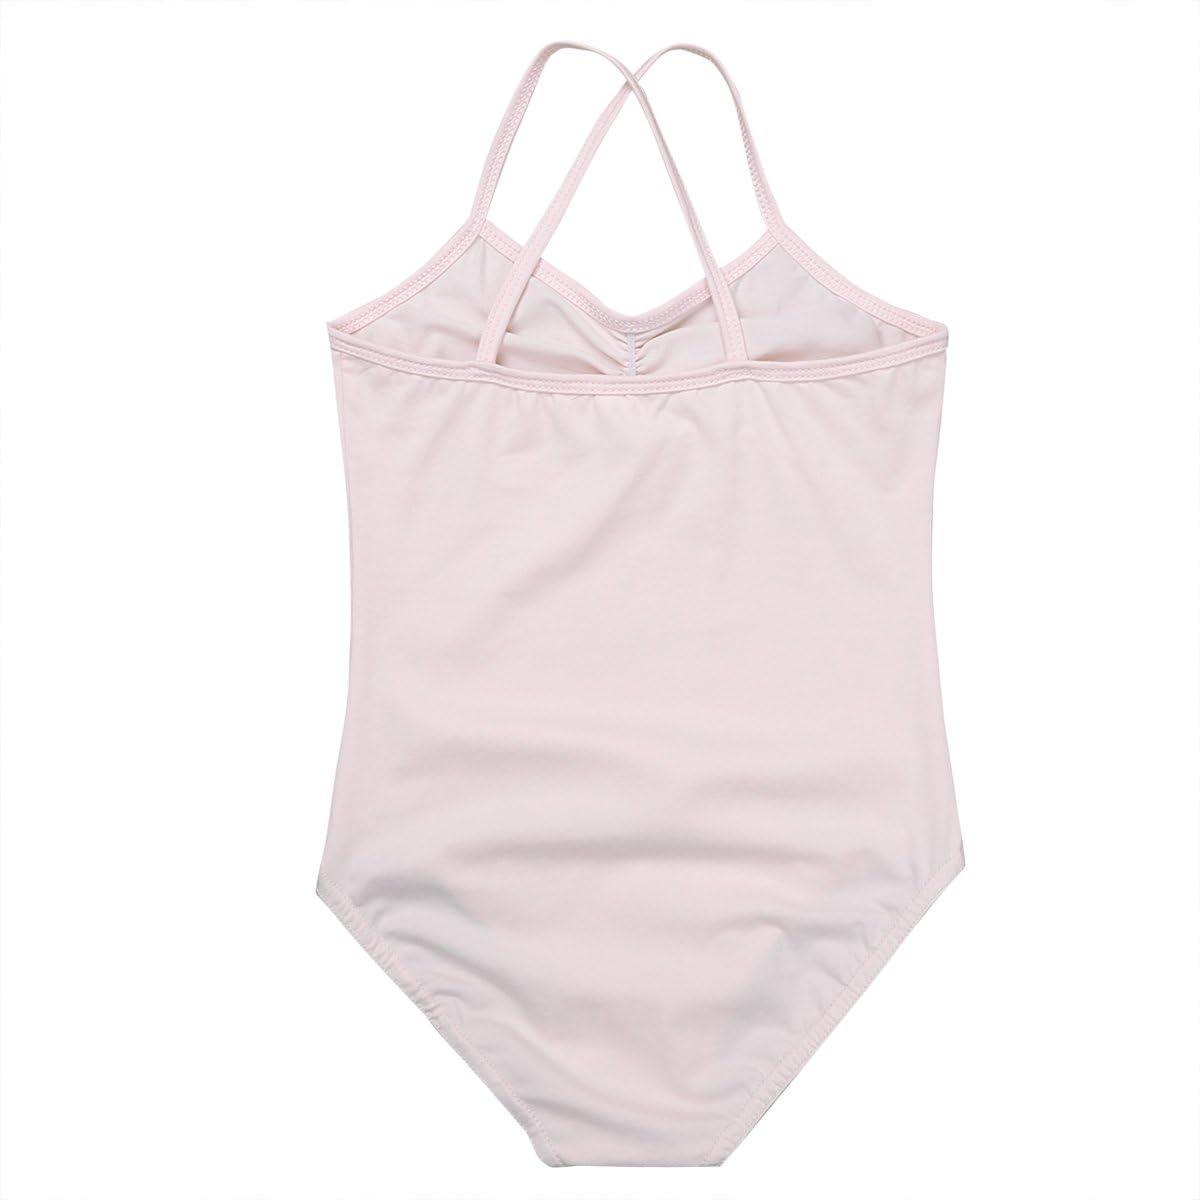 inlzdz Kids Girls Camisole Ballet Dance Gymnastics Leotard Bodysuit Tops Criss-cross Back Dance wear Costume